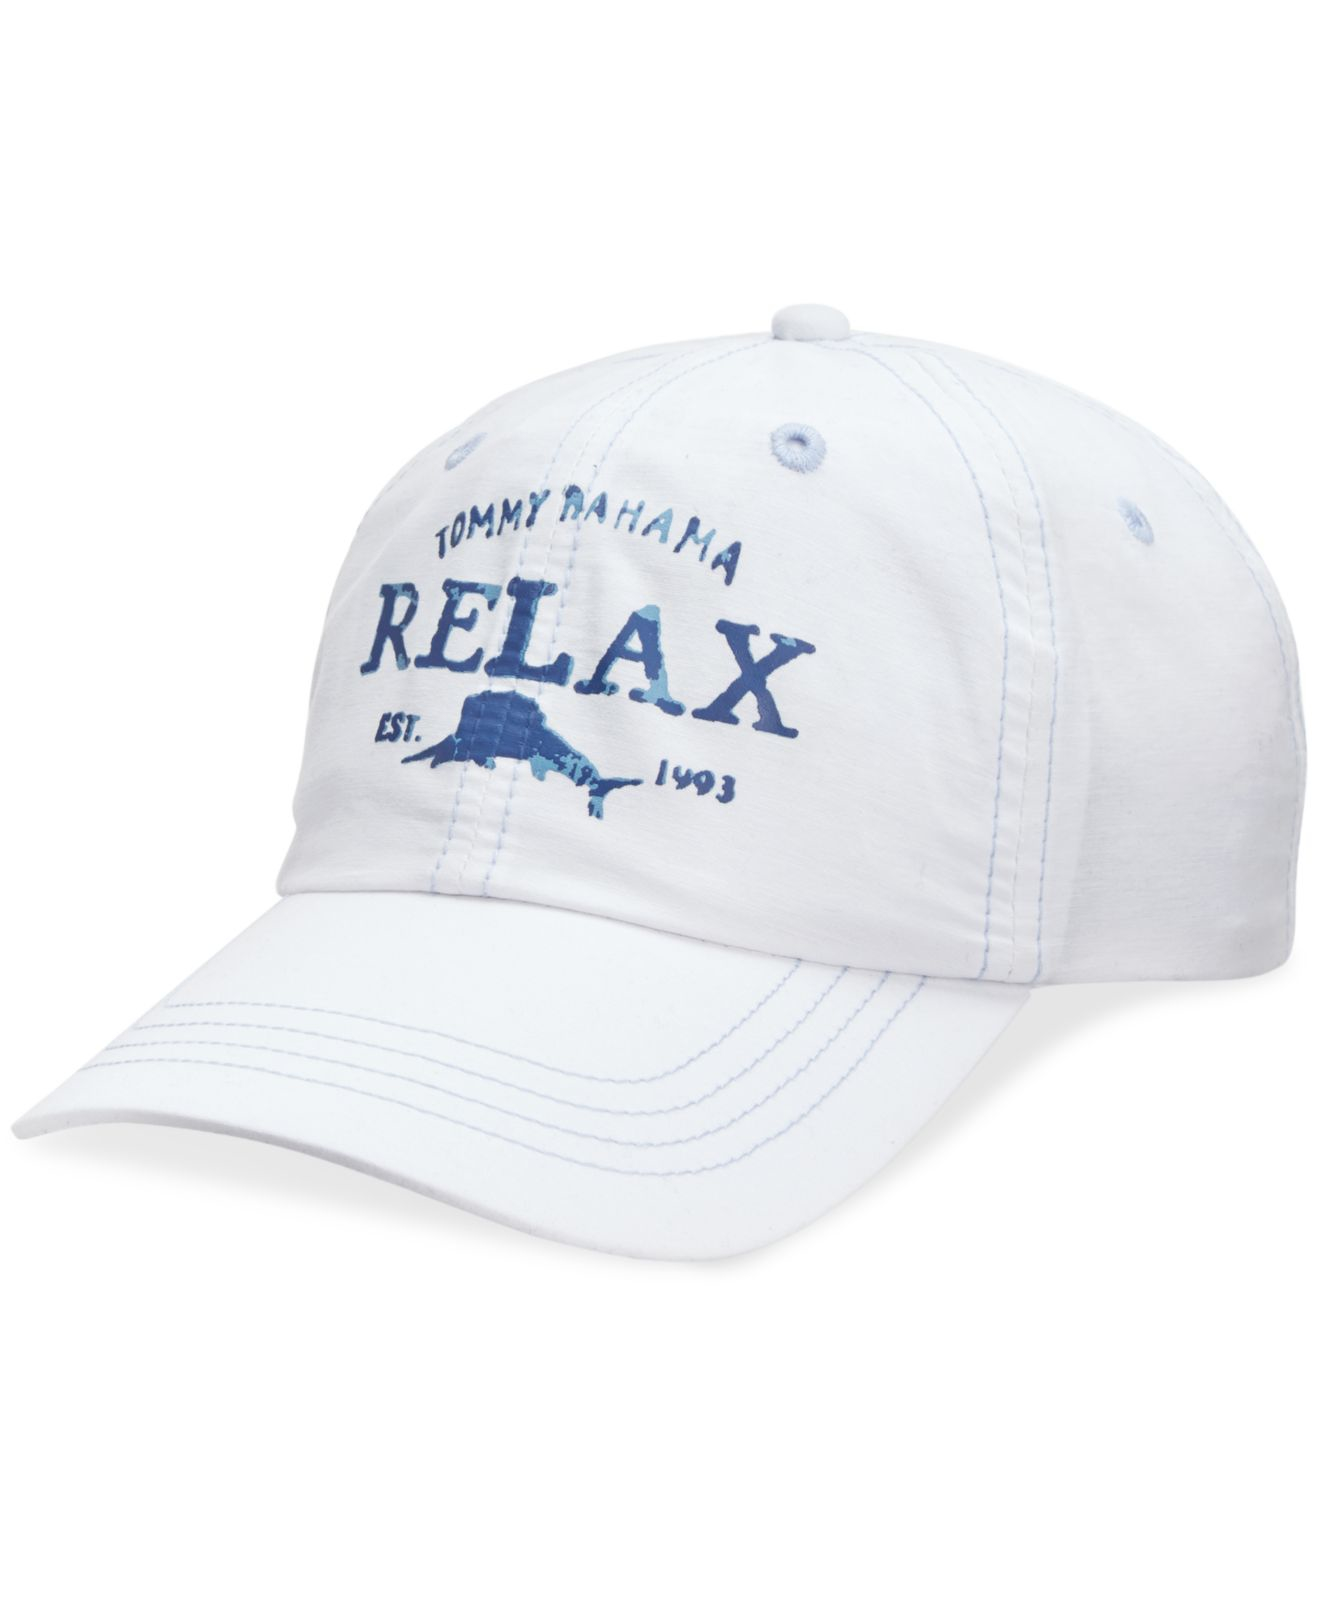 Lyst - Tommy Bahama Men s Swim Shady Cap in White for Men c9c8c753e50